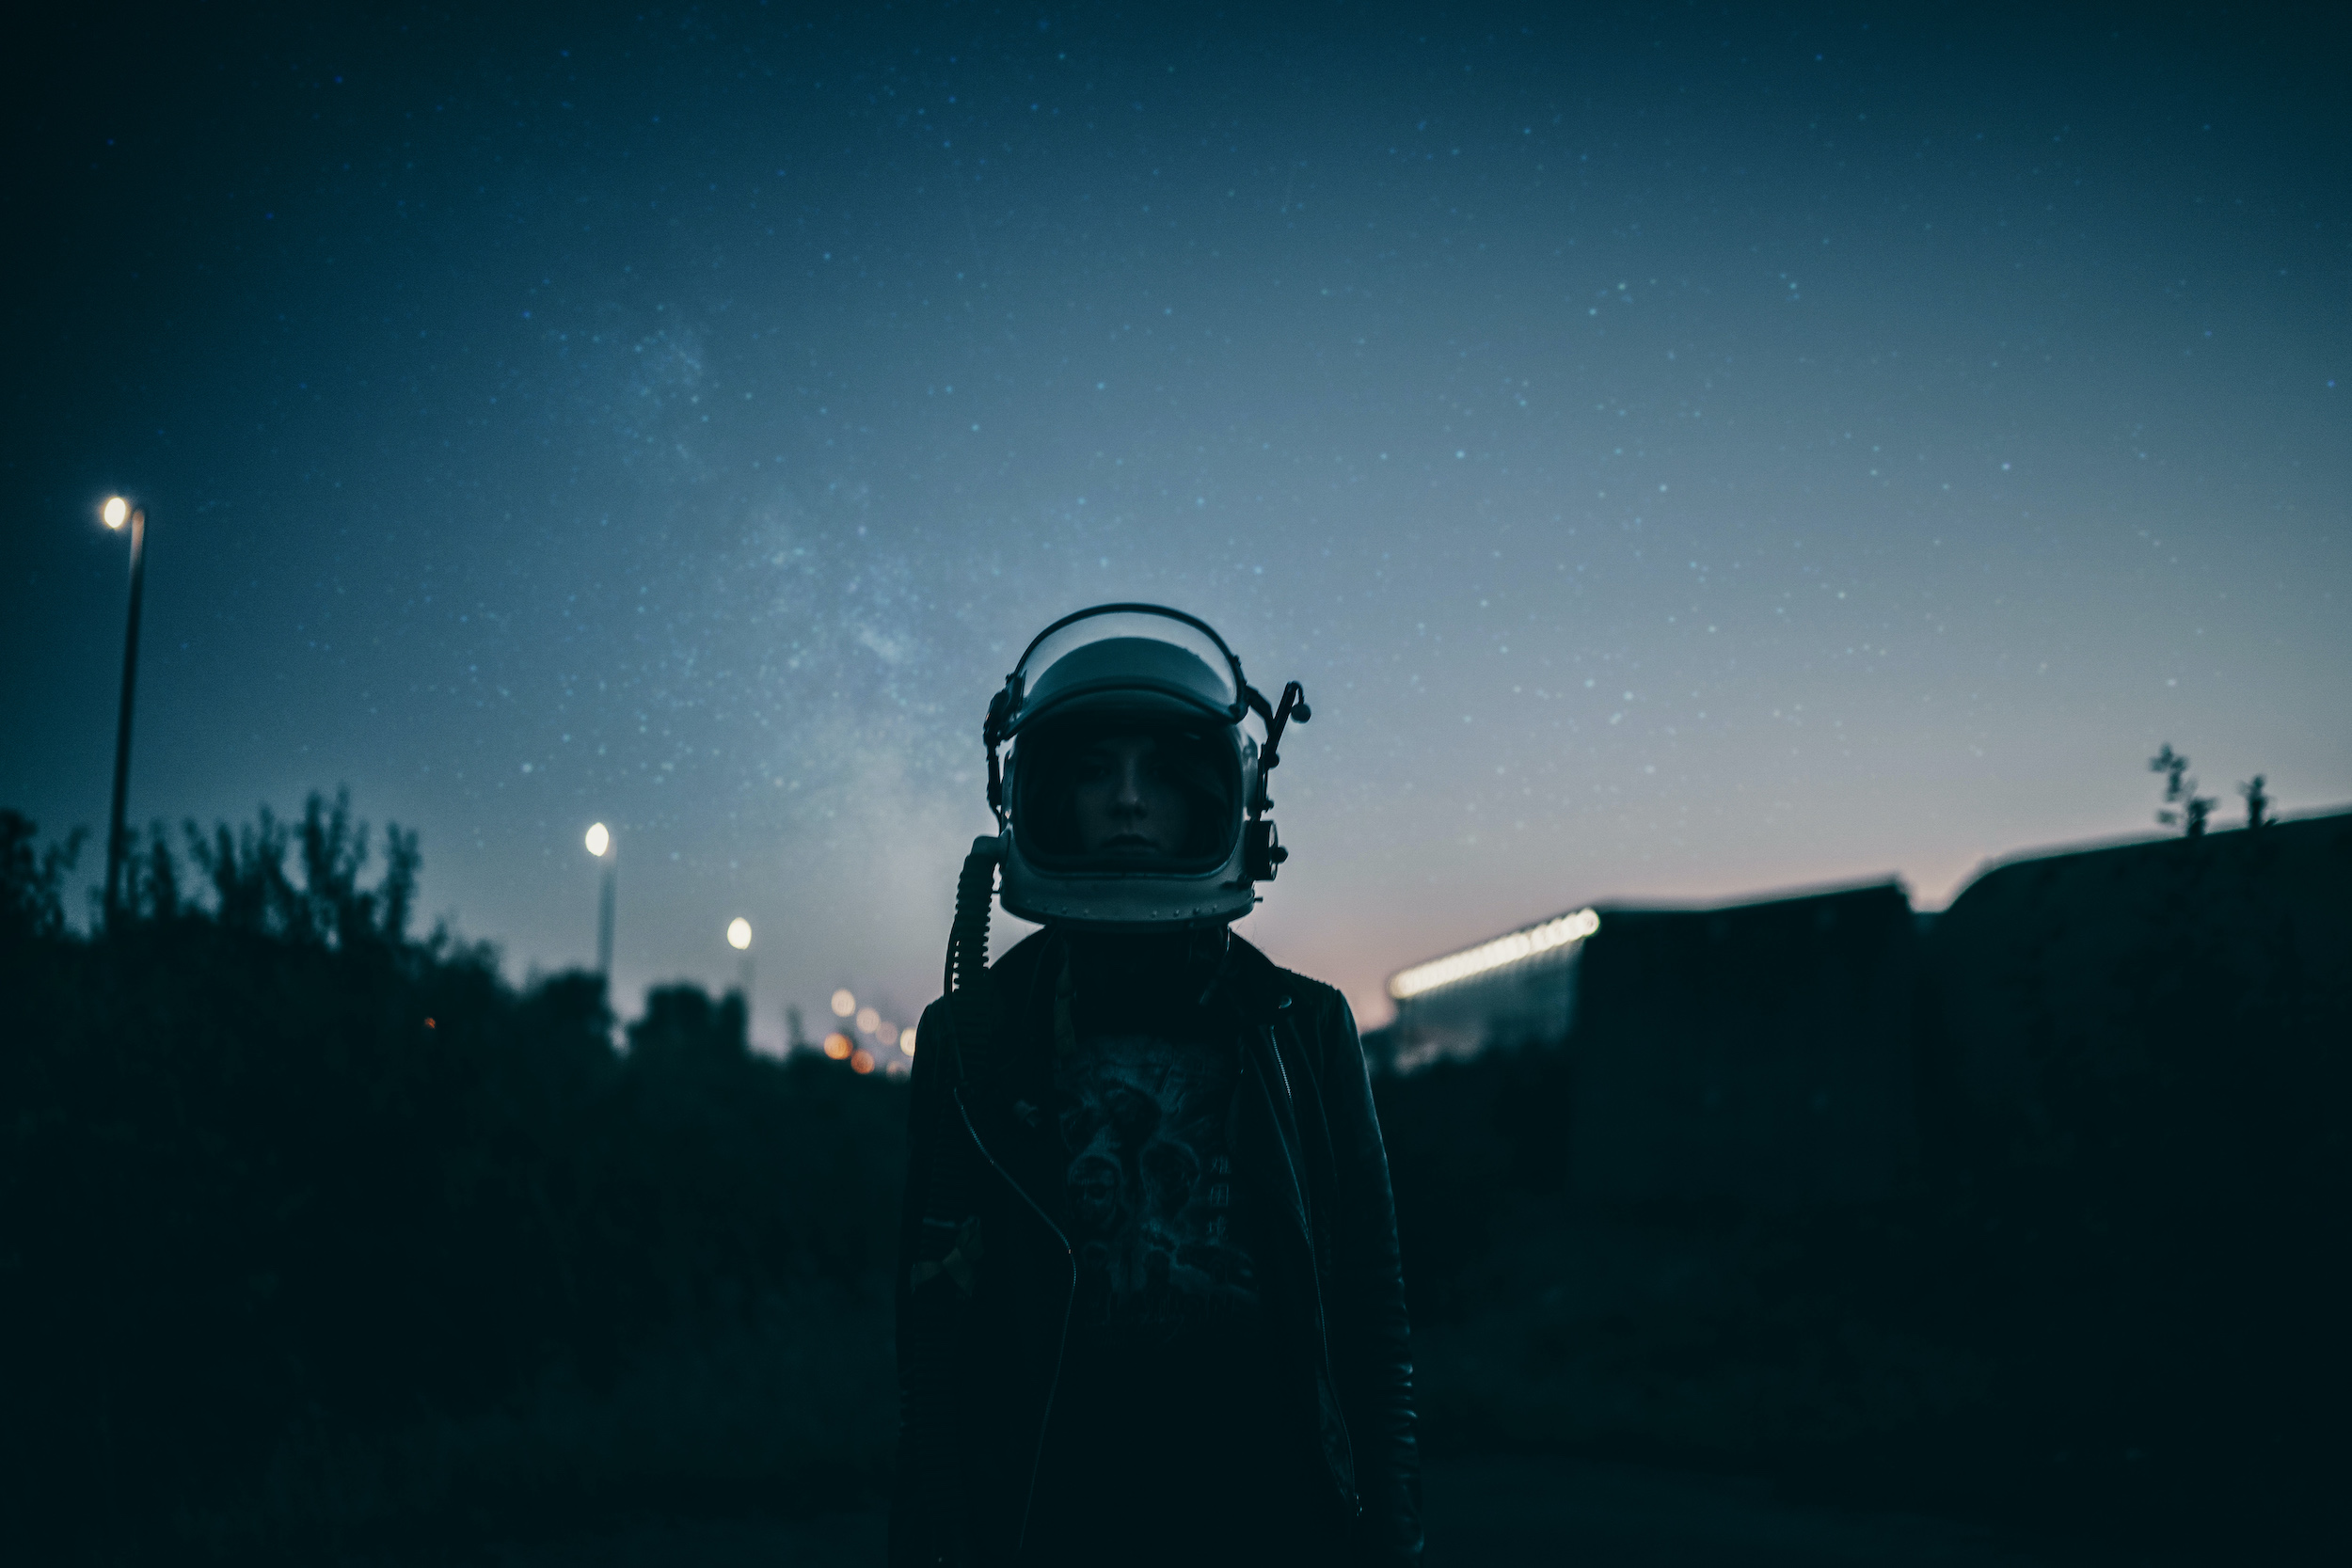 spacegirl, girl with-helmet, night, stars, galaxy, astronaut, cosmonaut, cosmoticgirl